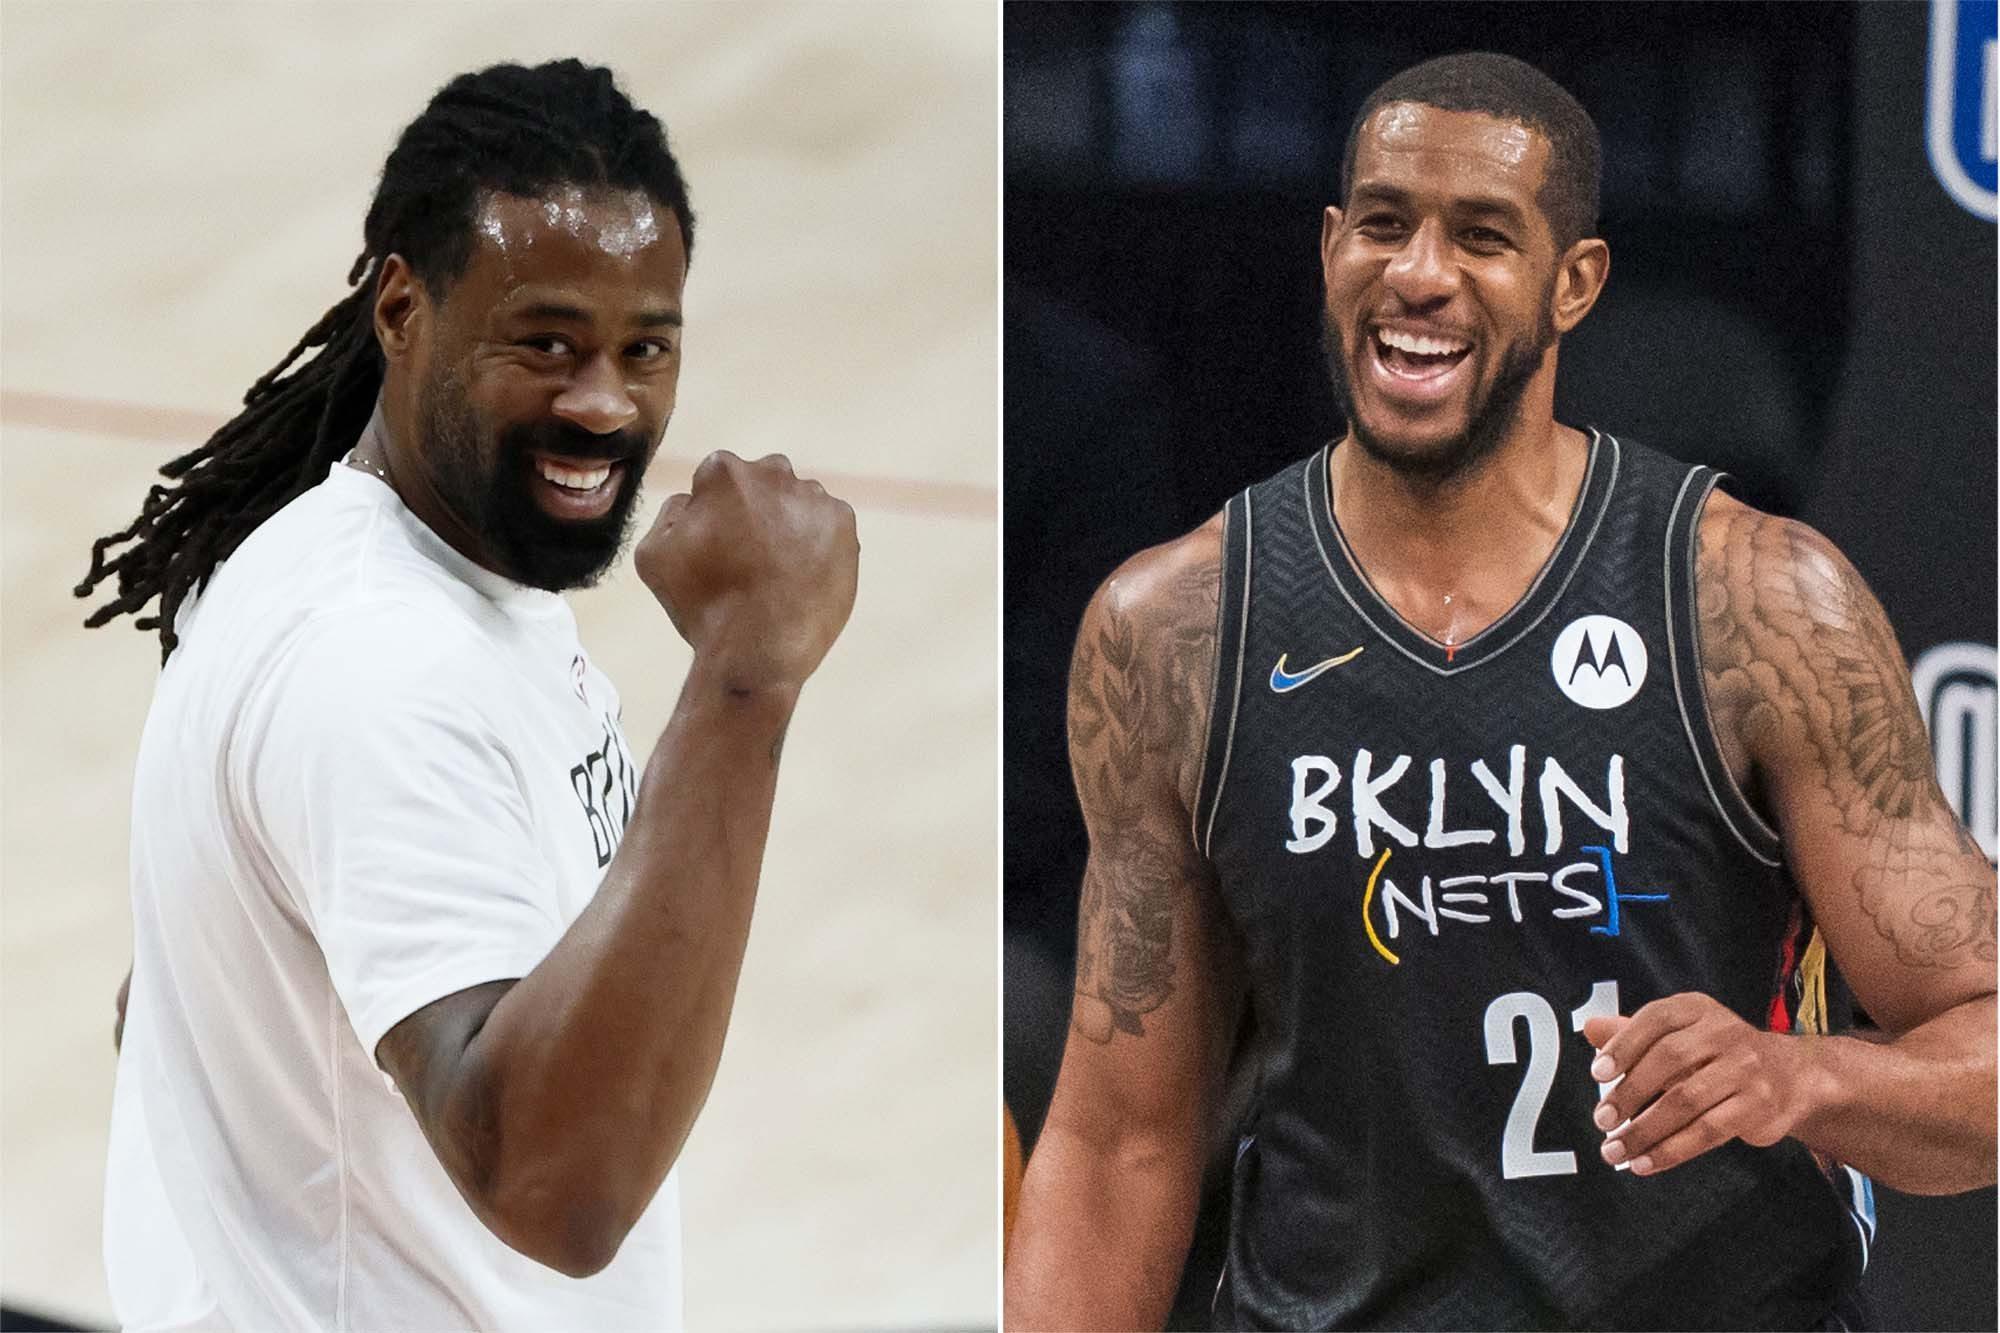 LaMarcus Aldridge Returns To Nets, DeAndre Jordan Traded To Pistons